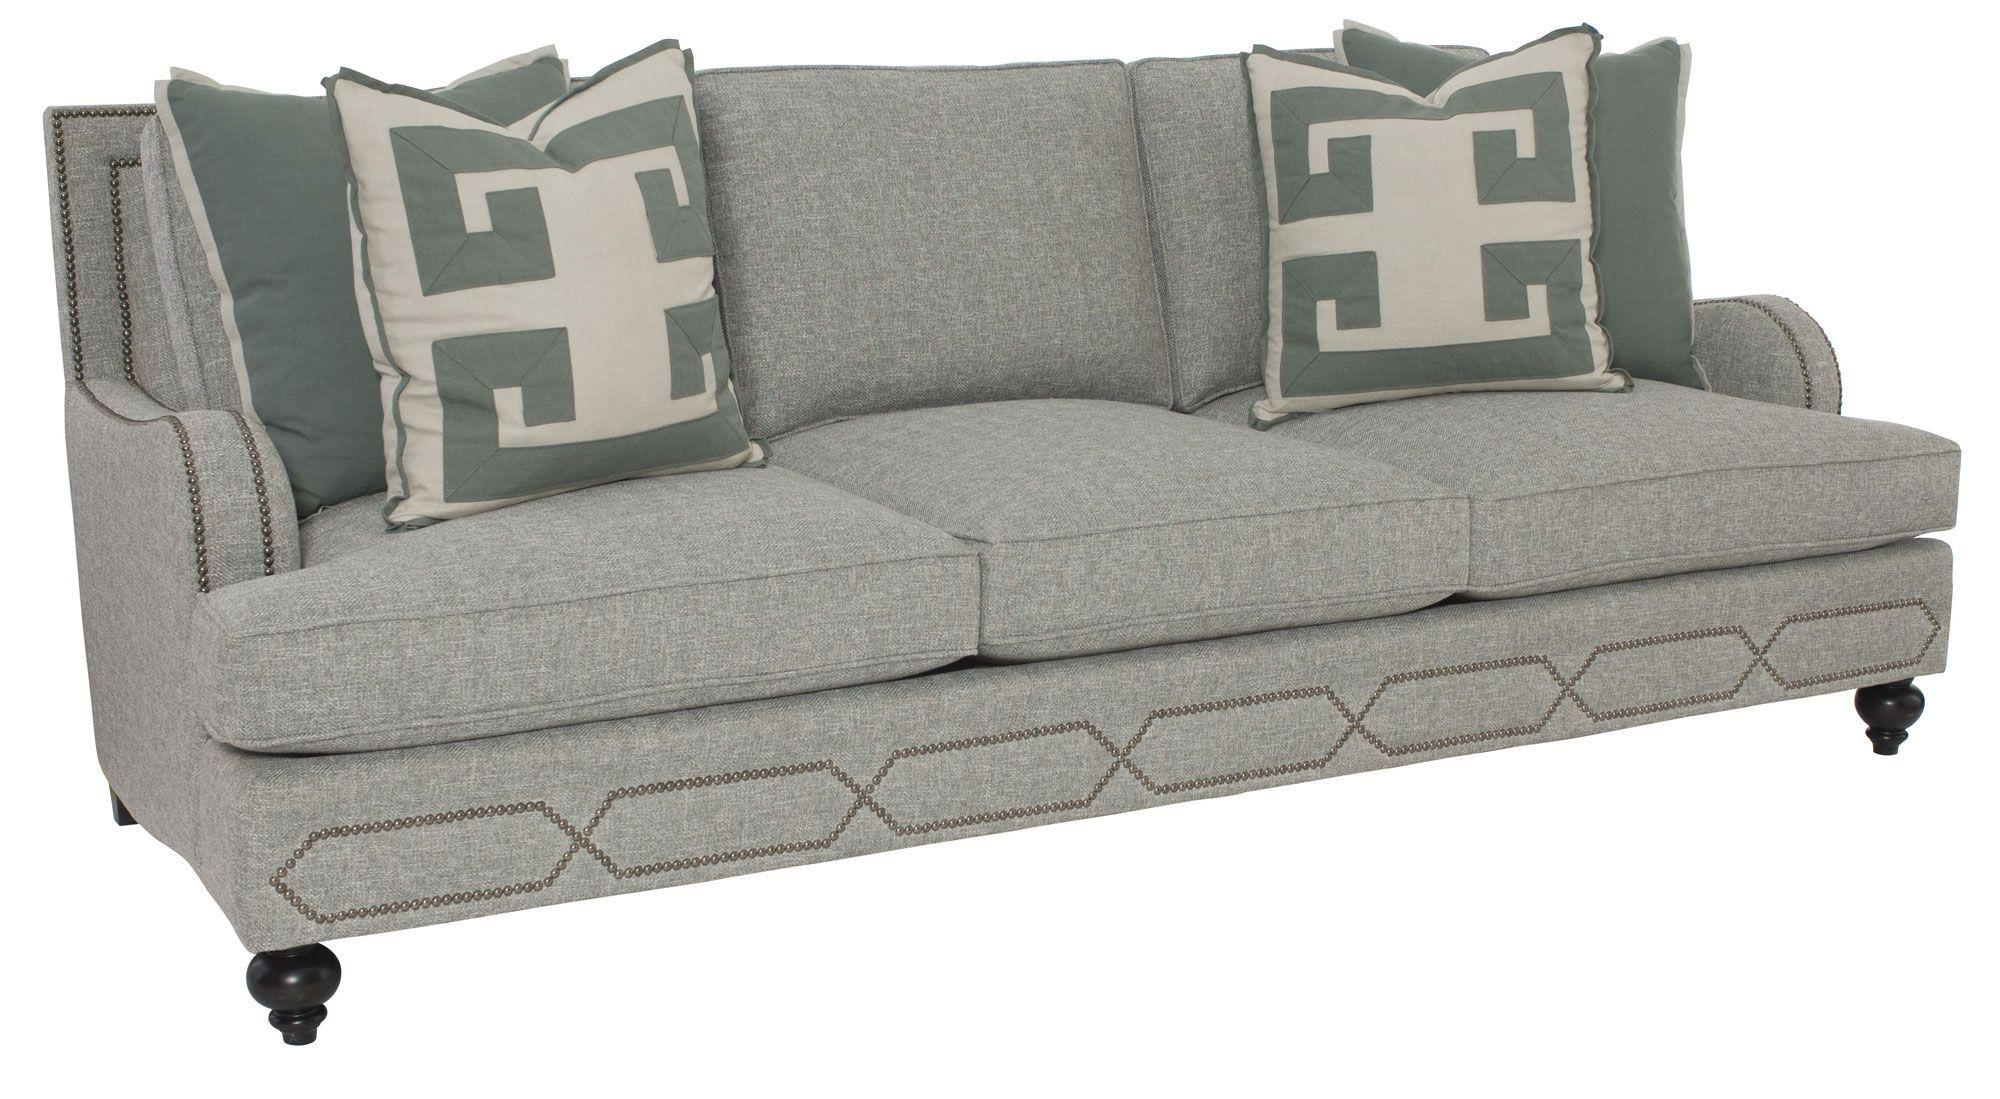 Sofa Bernhardt W 95 D 41 1 2 H 35 1 2 SH 17 1 2